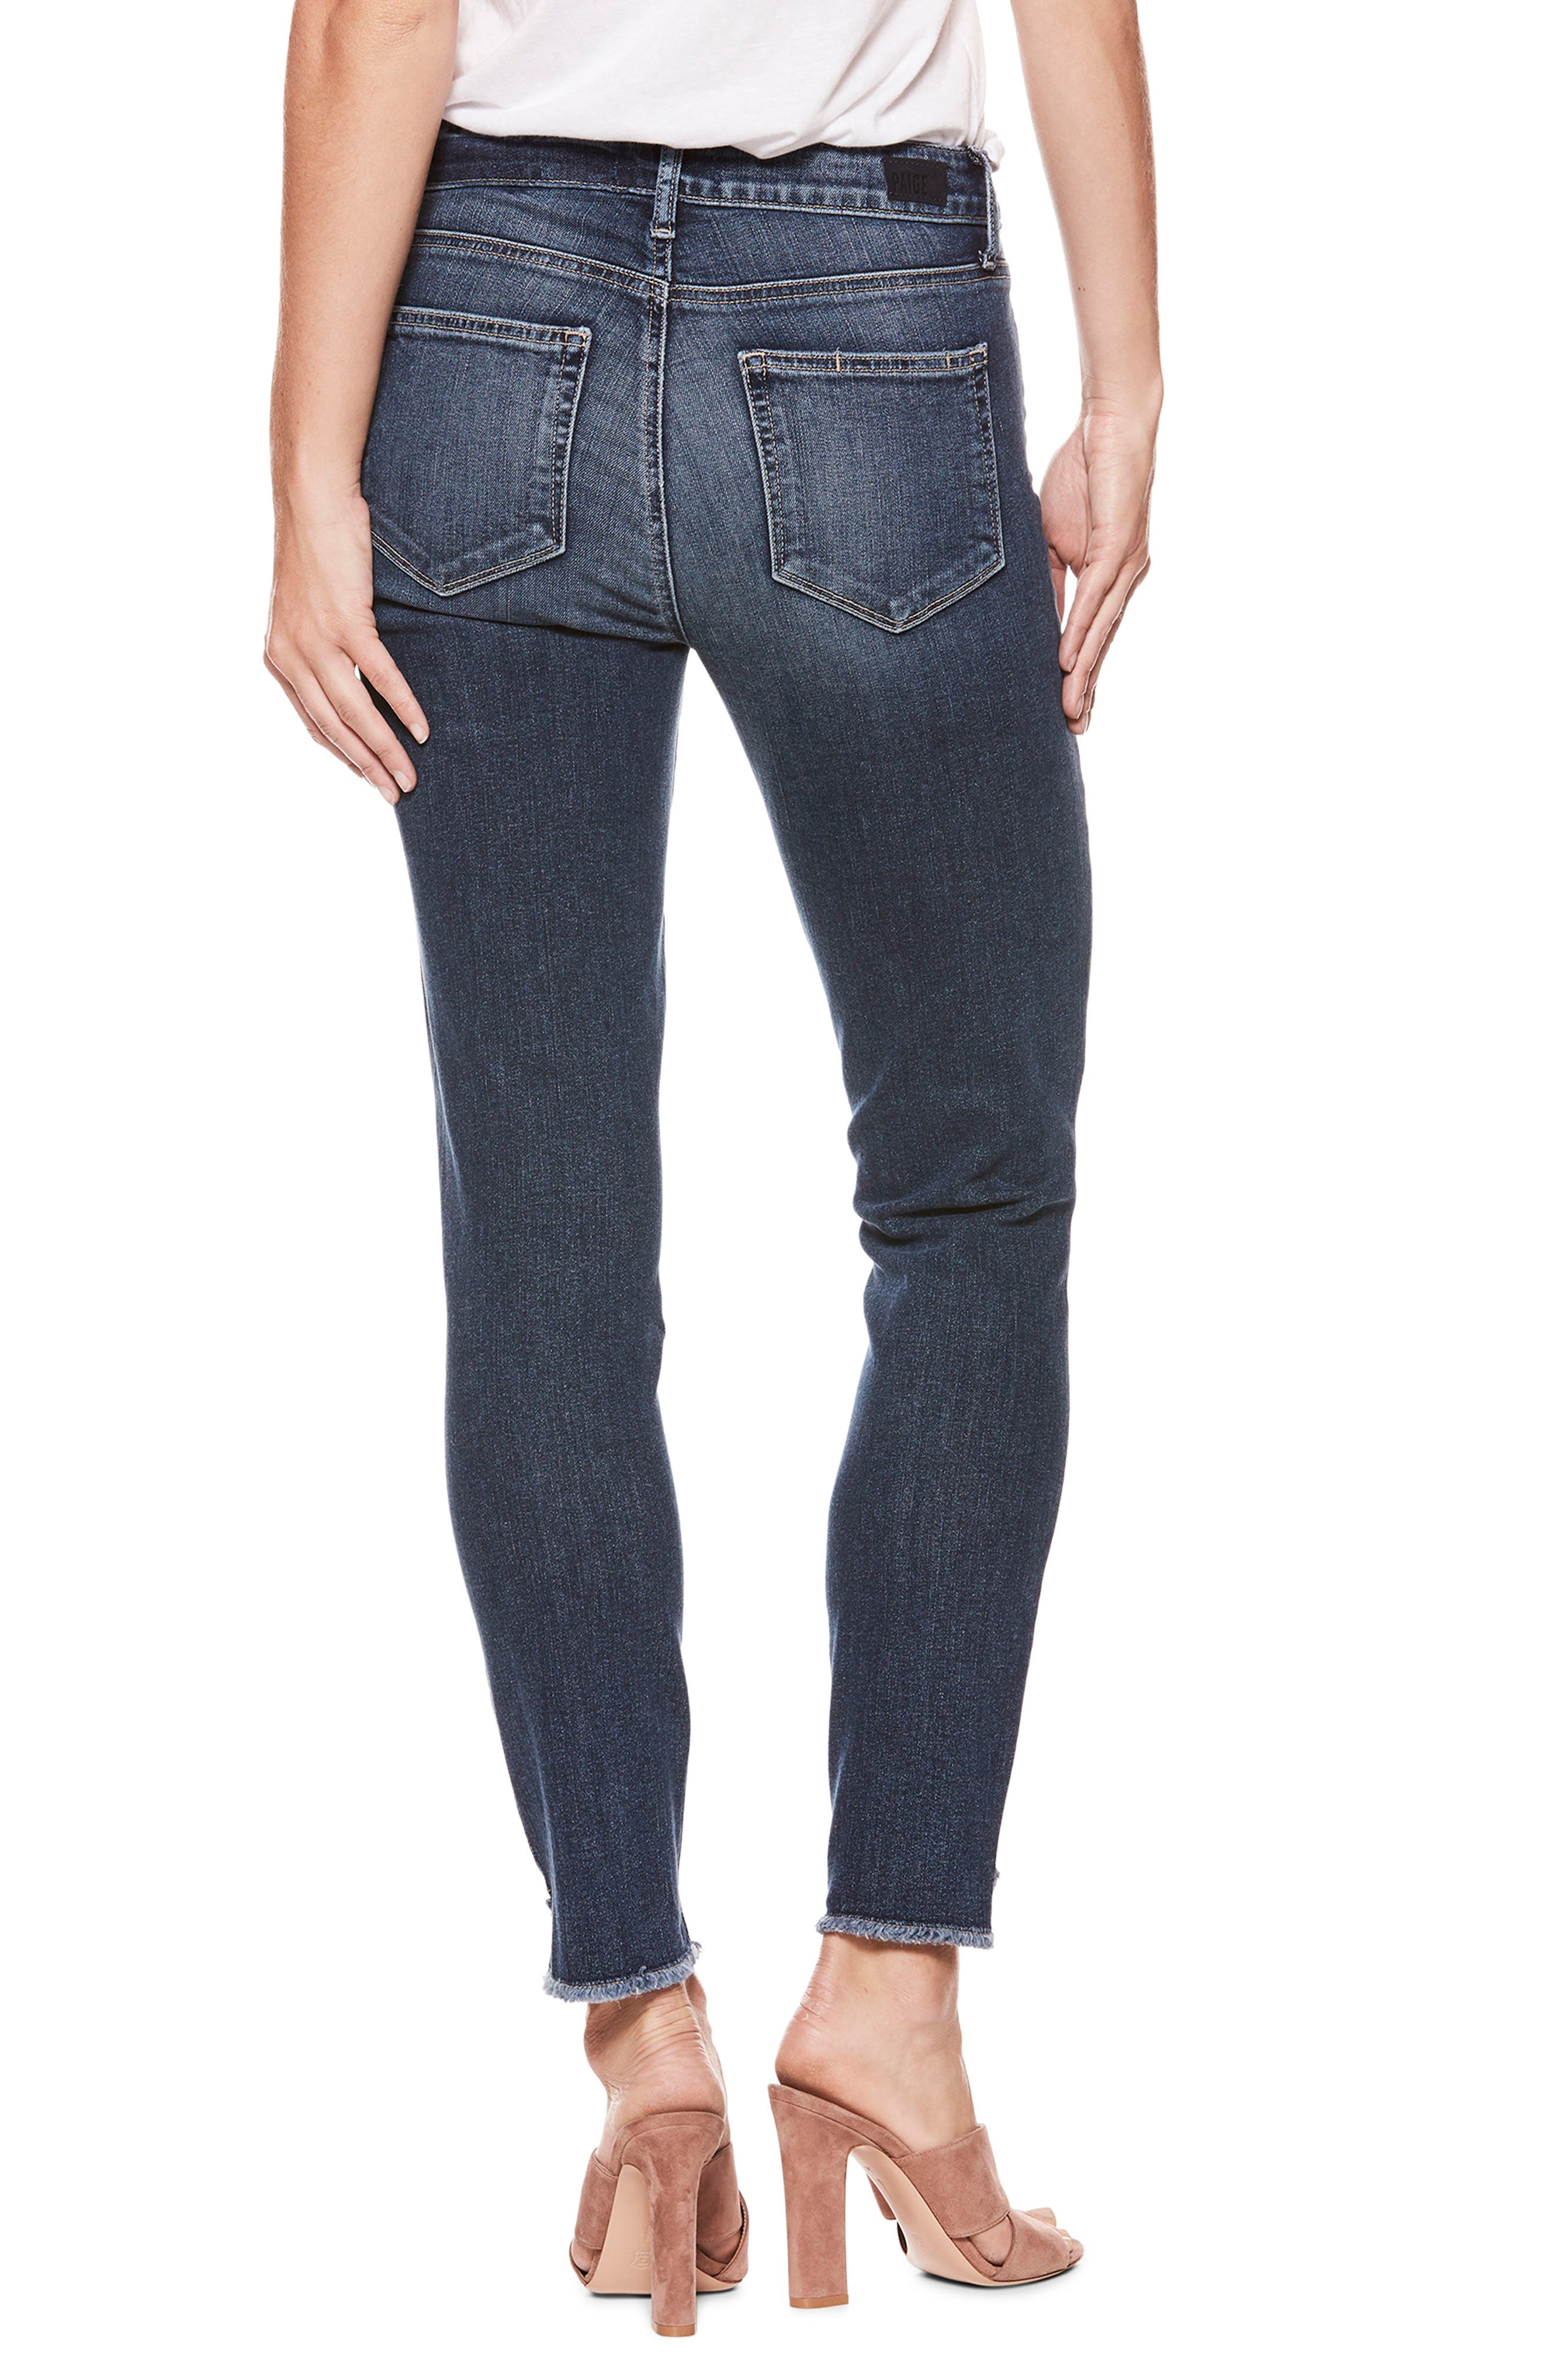 Hoxton High Waist Ankle Skinny Jeans,                             Alternate thumbnail 3, color,                             Blue